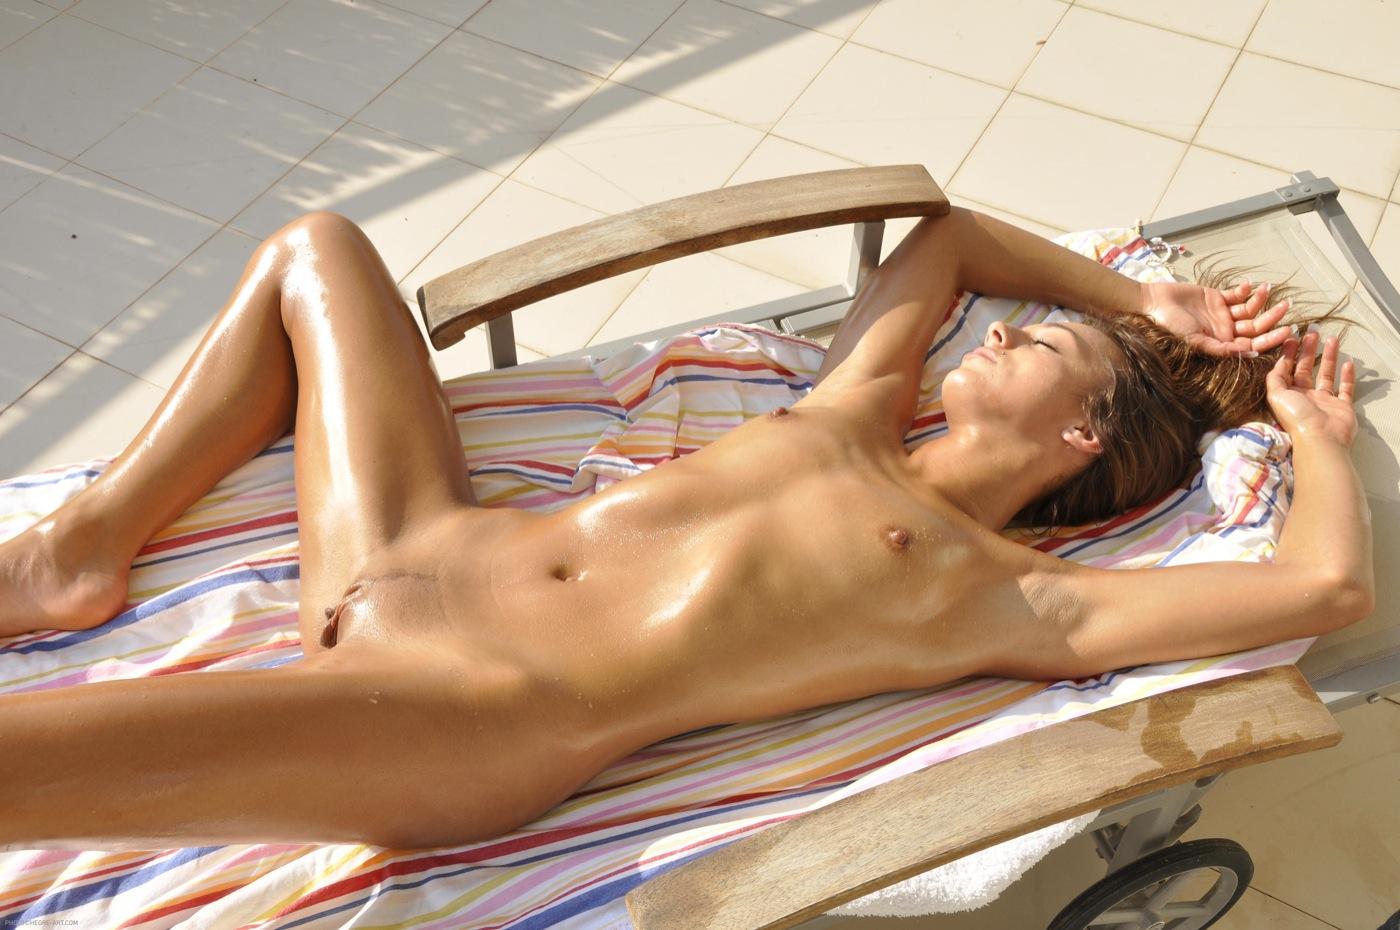 Sweet nude girls tanning on an empty beach